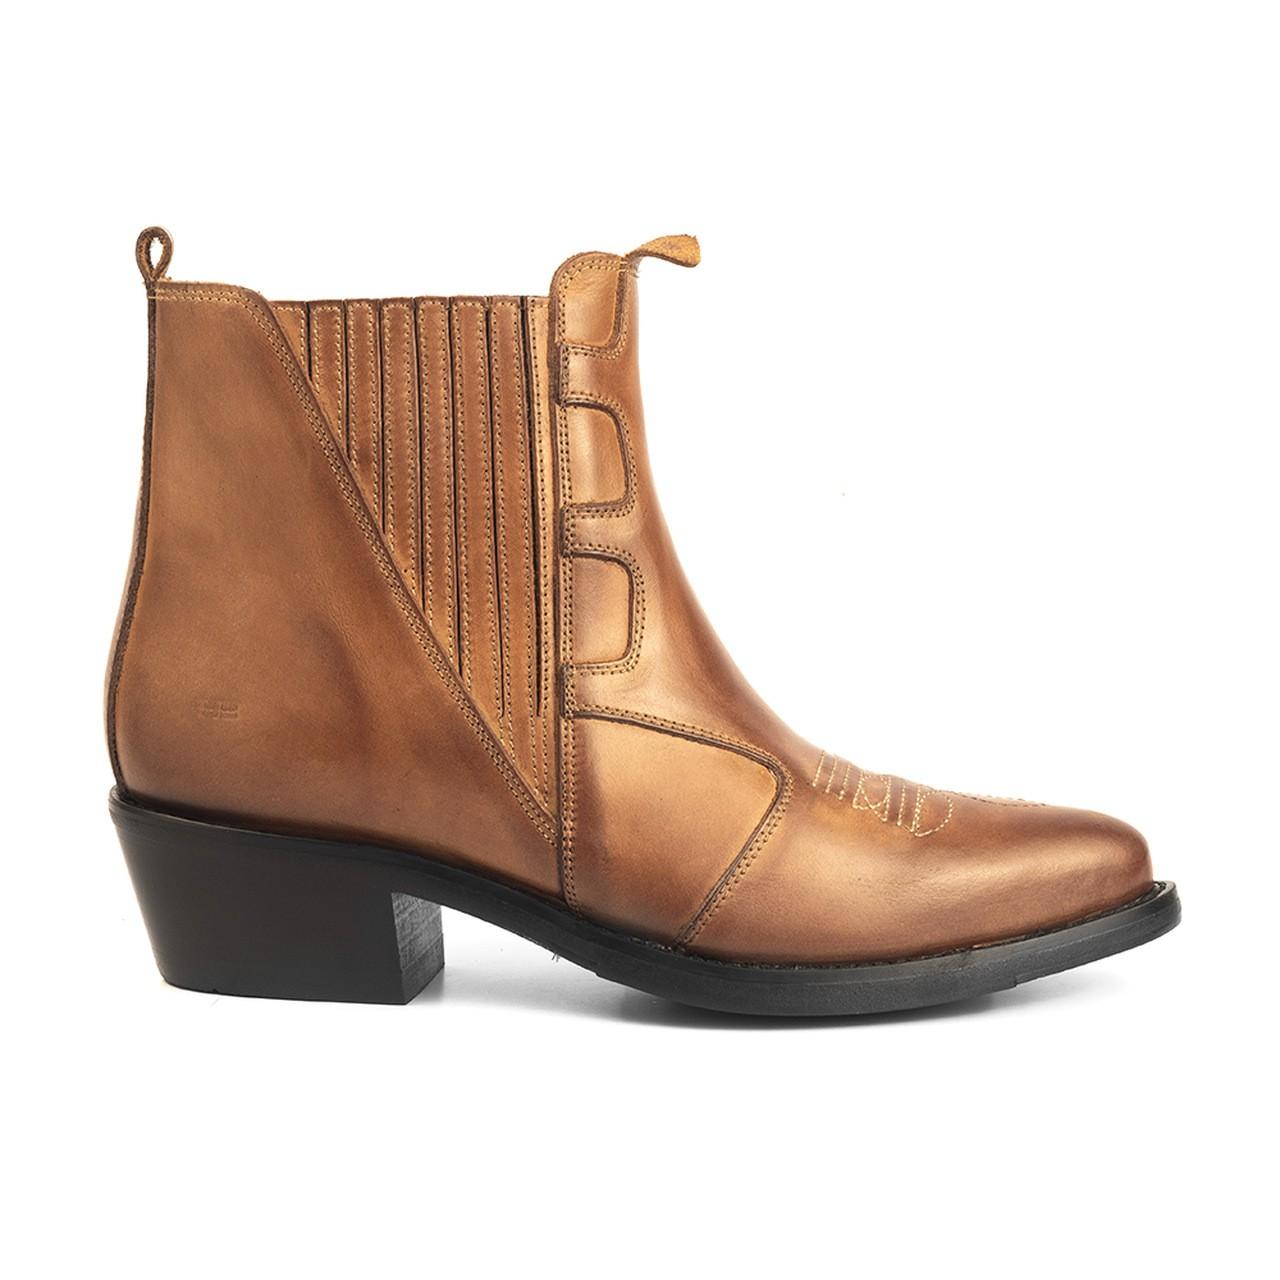 Bota Masculina Country Texana HB Agabe Boots 100.003 - Lt Havana - Sola de Borracha